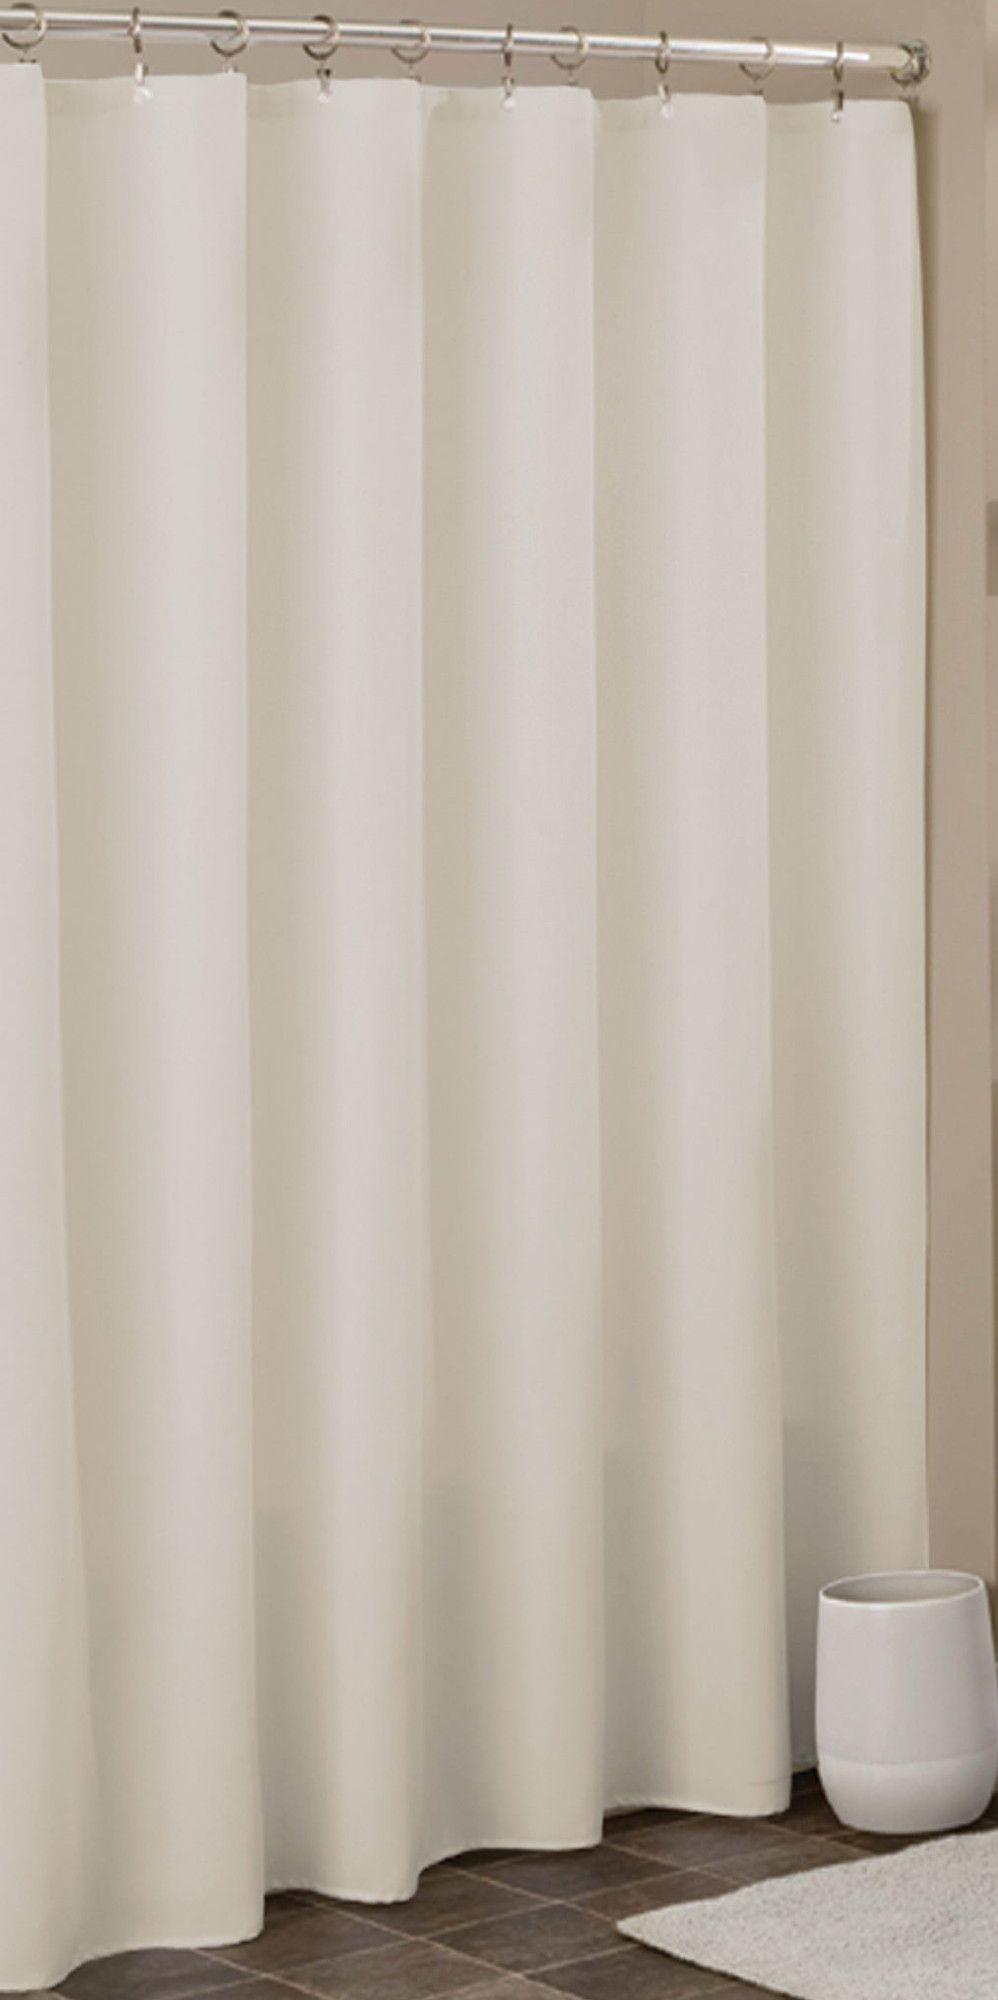 Vinyl Anti Mildew Shower Curtain Liner